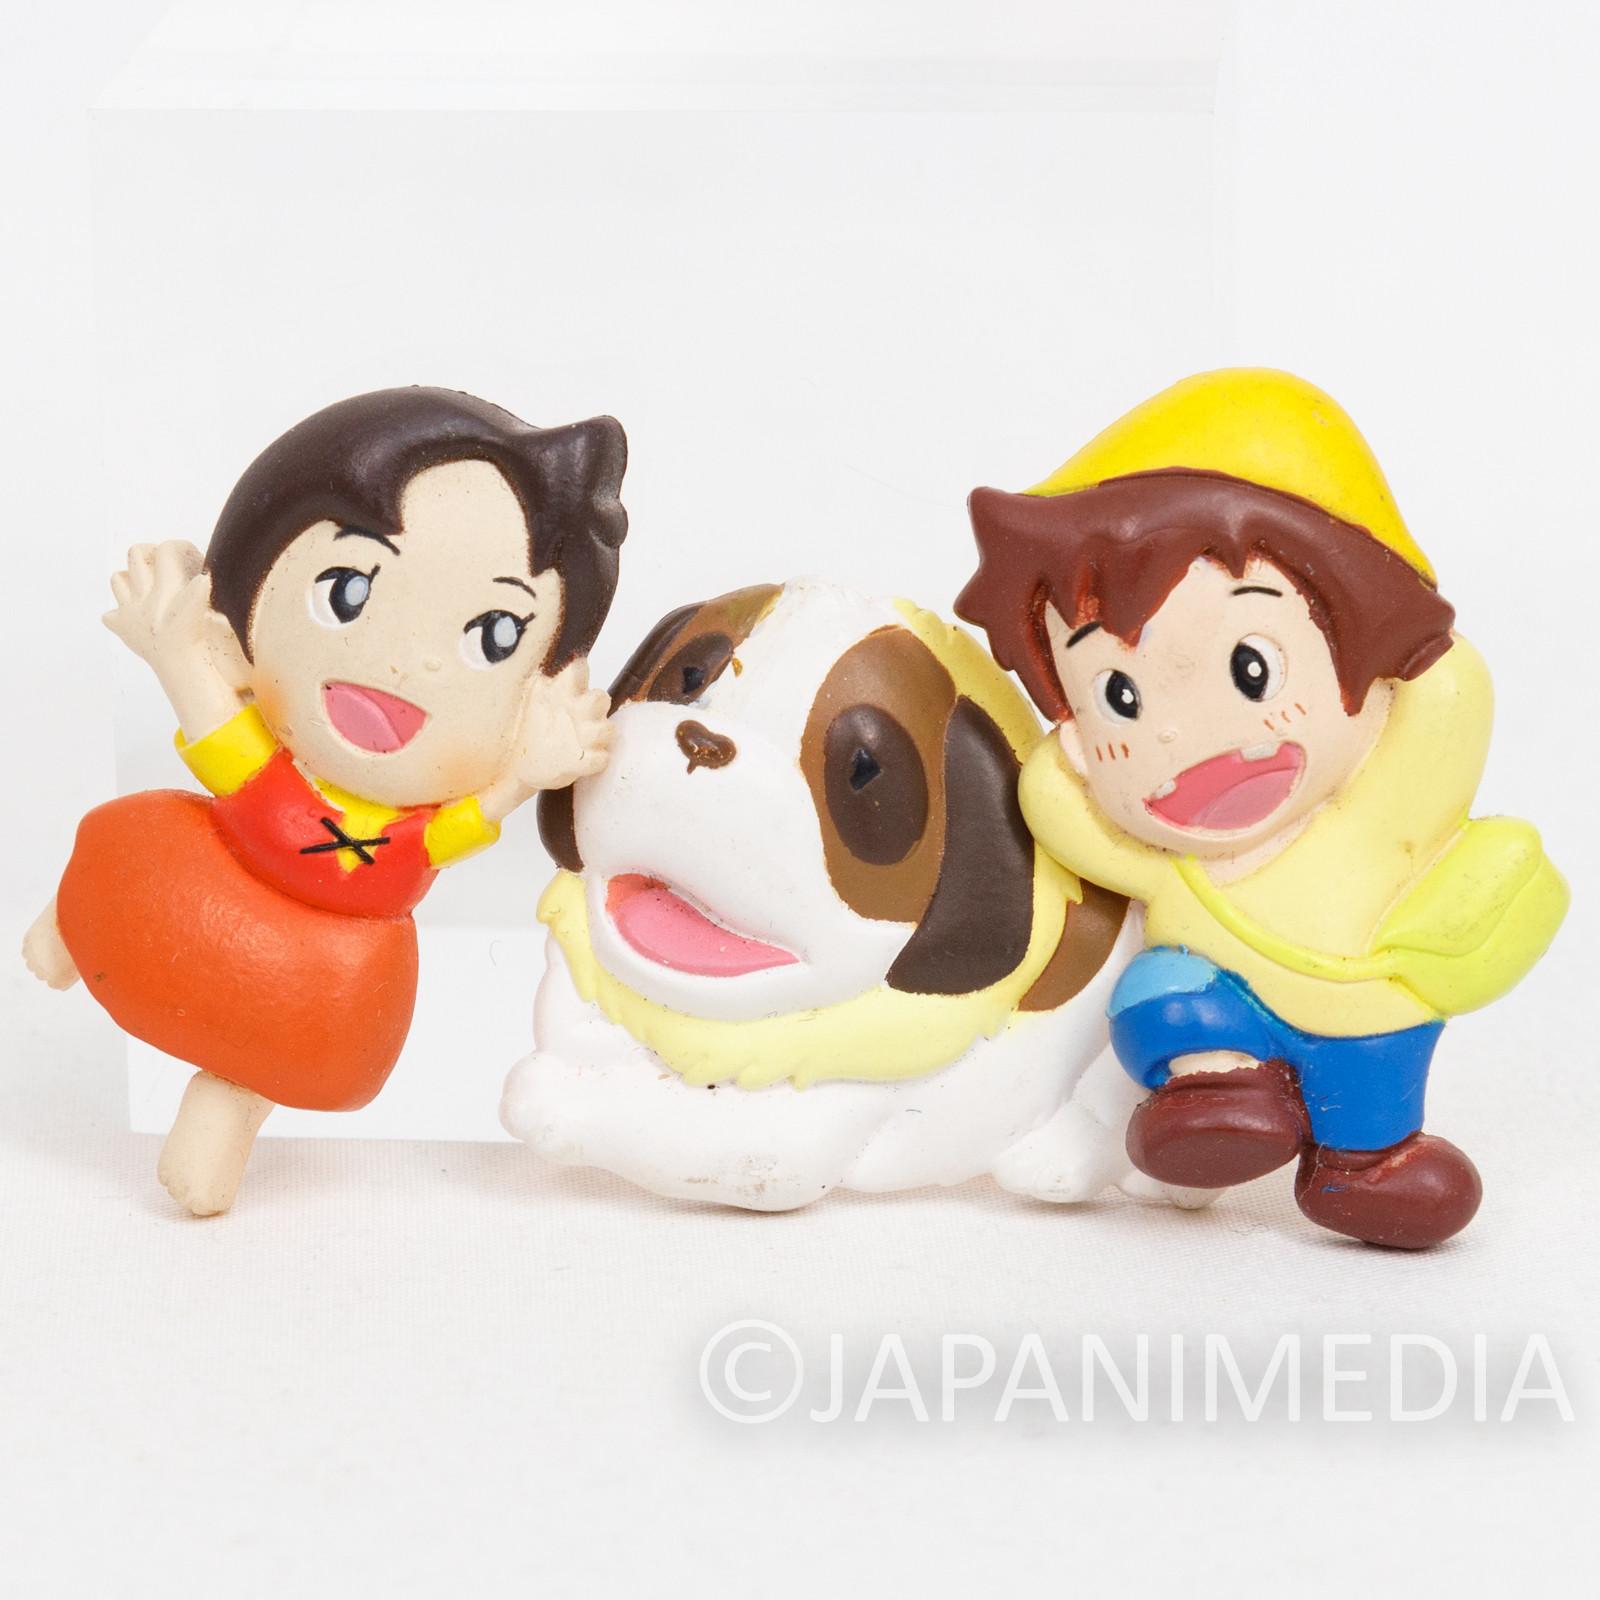 Heidi Girl of the Alps Mascot Magnet 3pc Set Heidi/ Peter/ Josef JAPAN ANIME